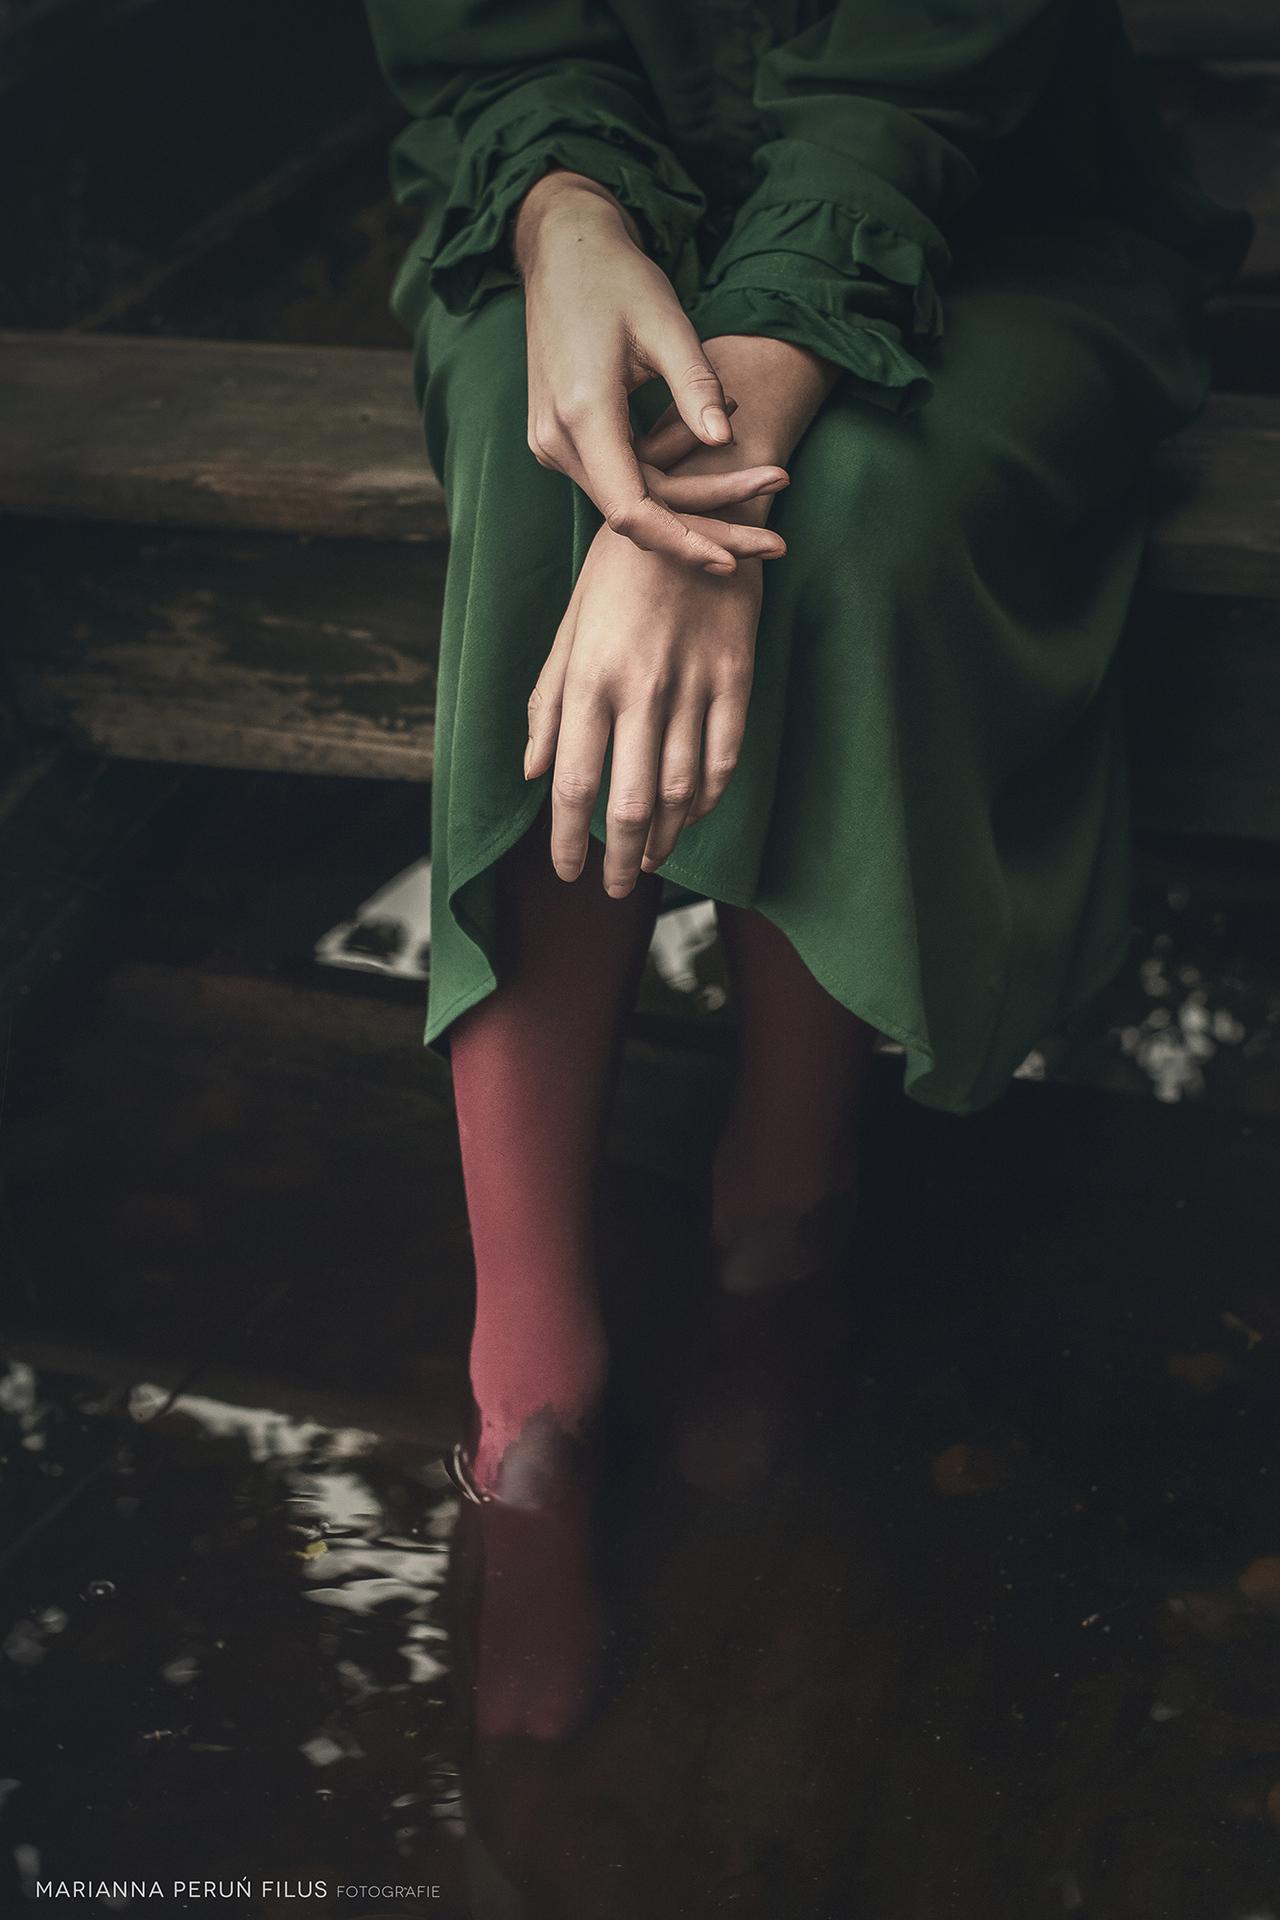 panna z mokrymi stopami